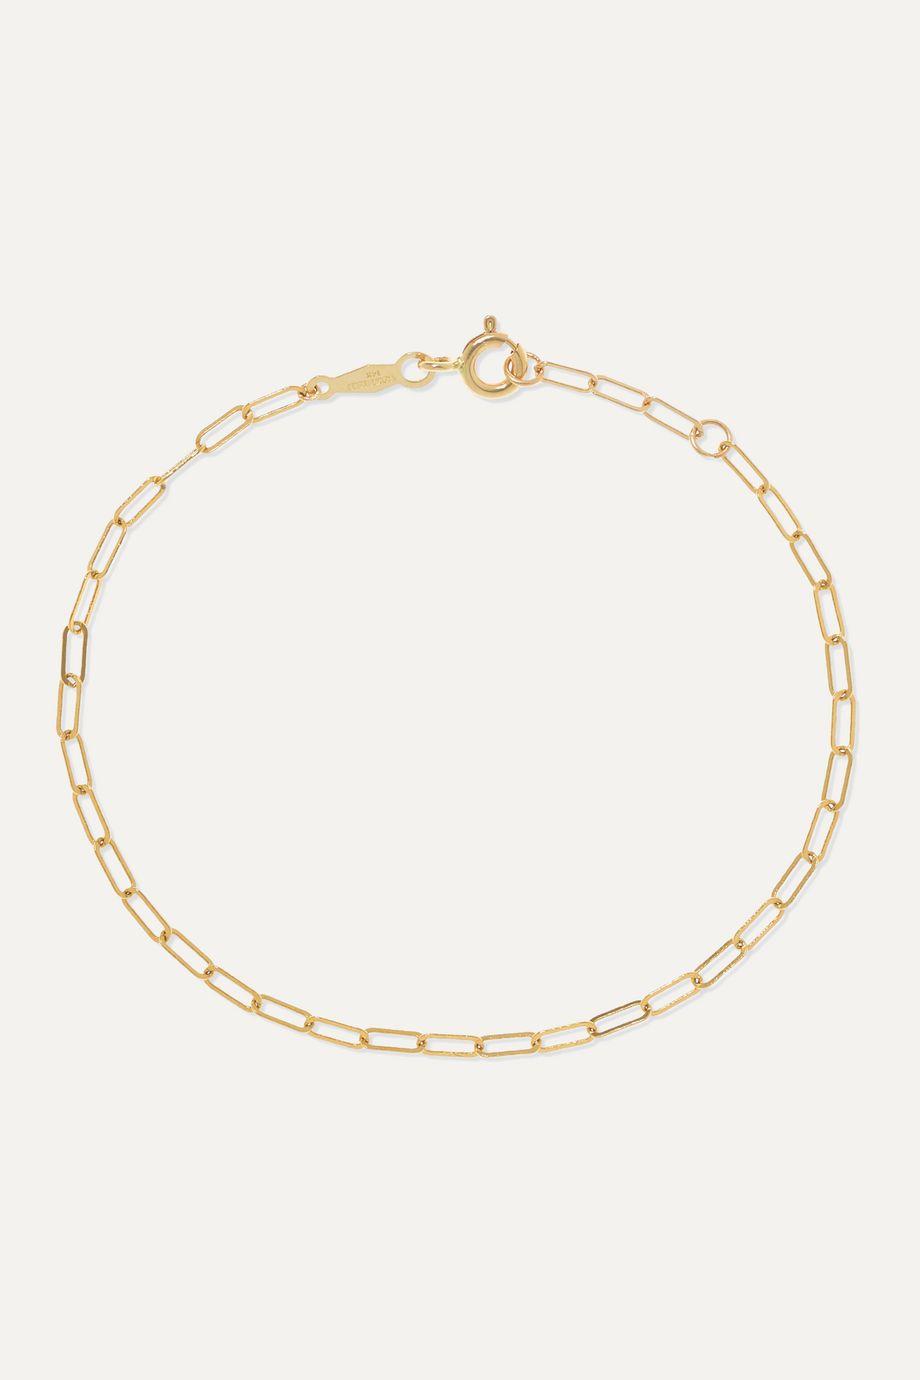 Catbird + NET SUSTAIN 1976 gold bracelet